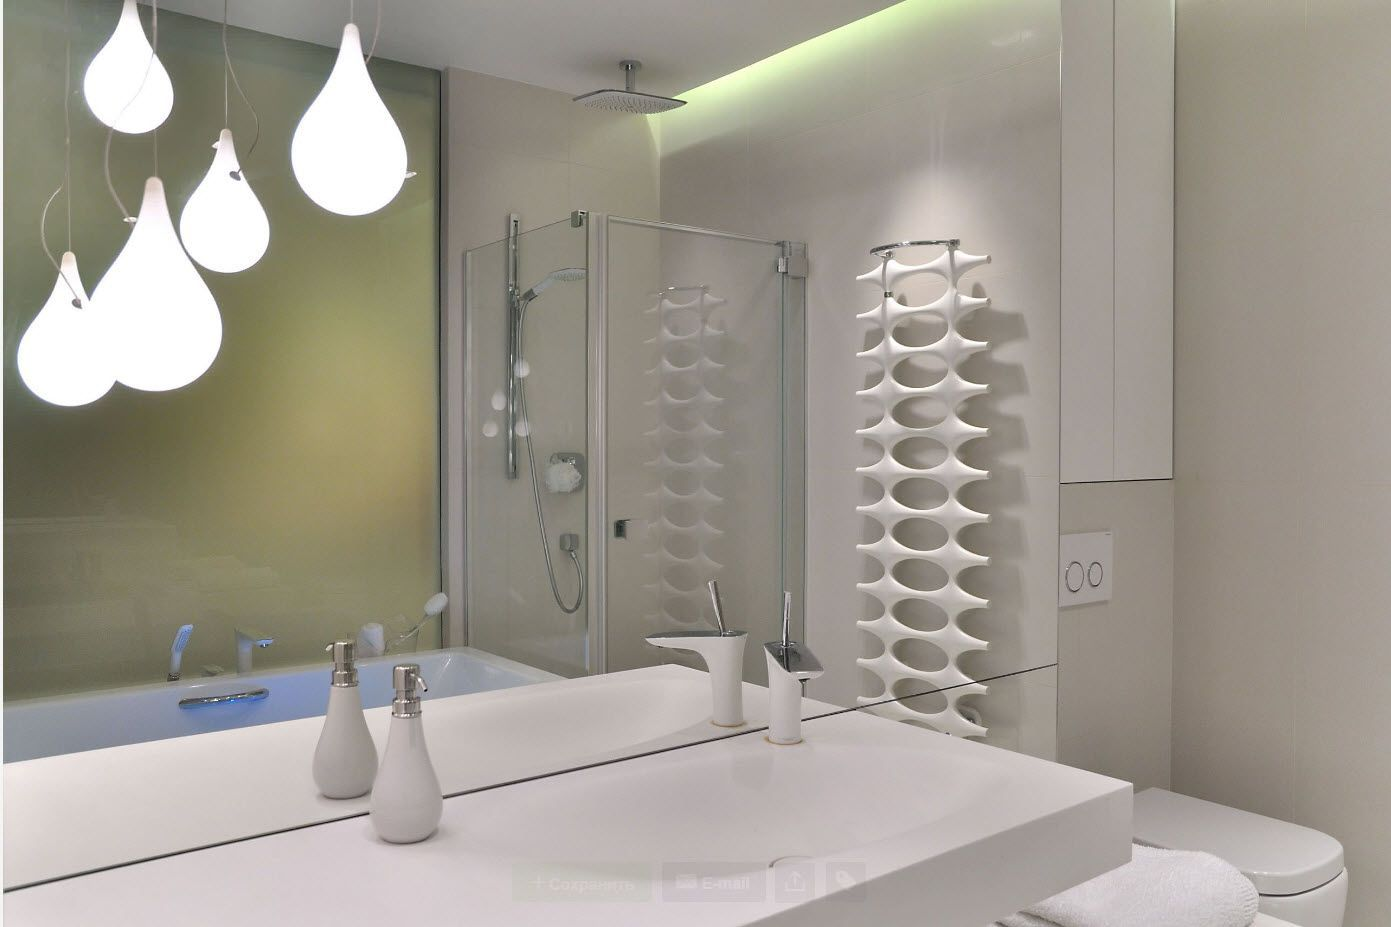 Water radiator of peculiar form in the modern white creamy bathroom